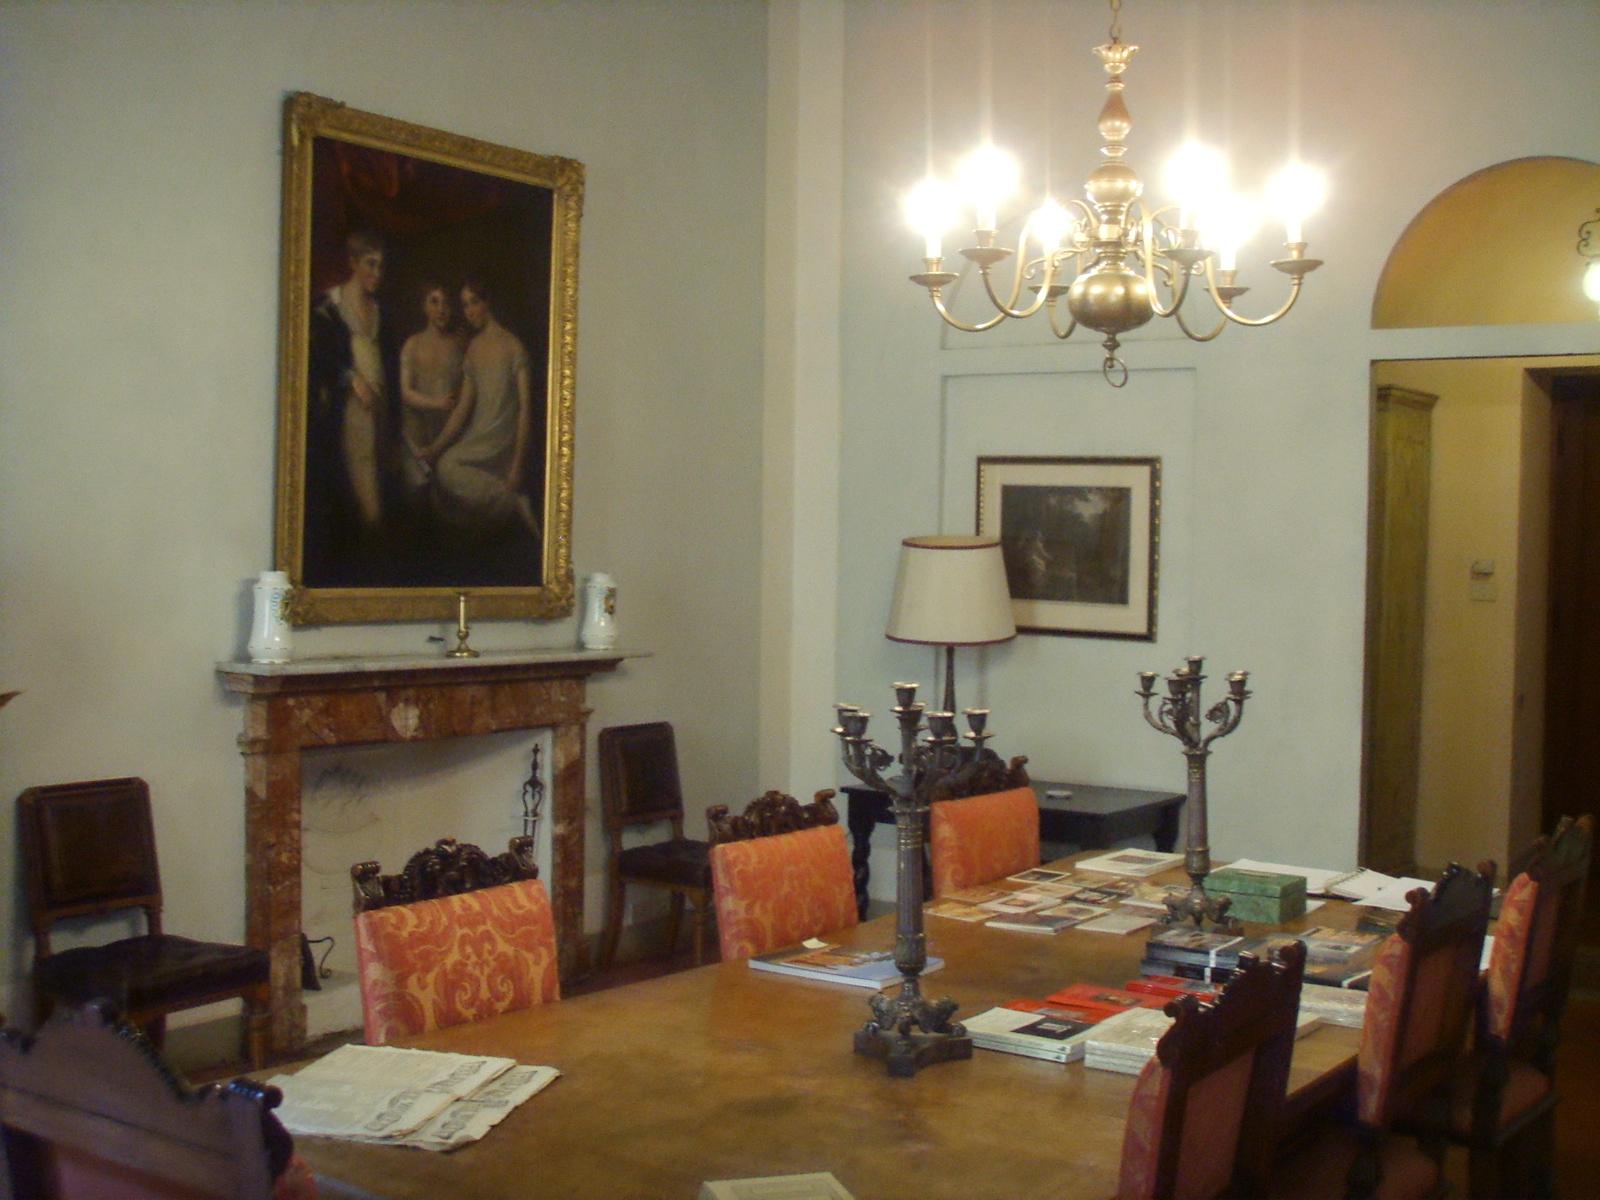 File:Casa Guidi Sala Da Pranzo 02.JPG Wikimedia Commons #976334 1600 1200 Sala Da Pranzo Pareti